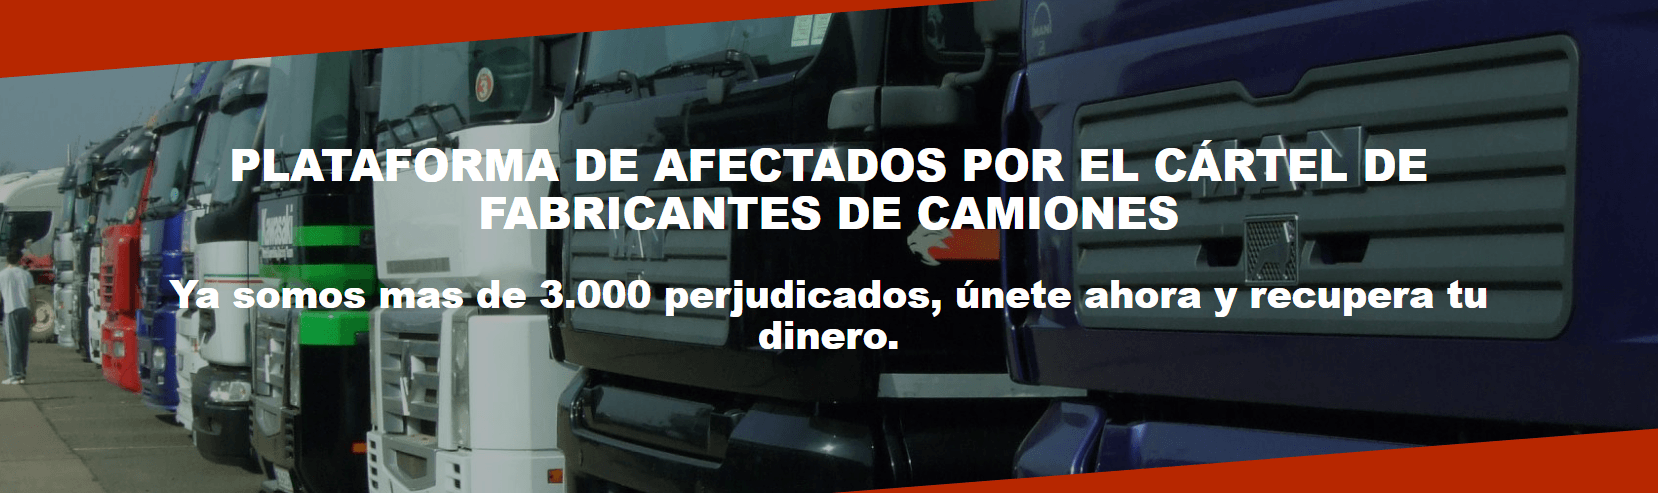 cártel fabricantes de camiones